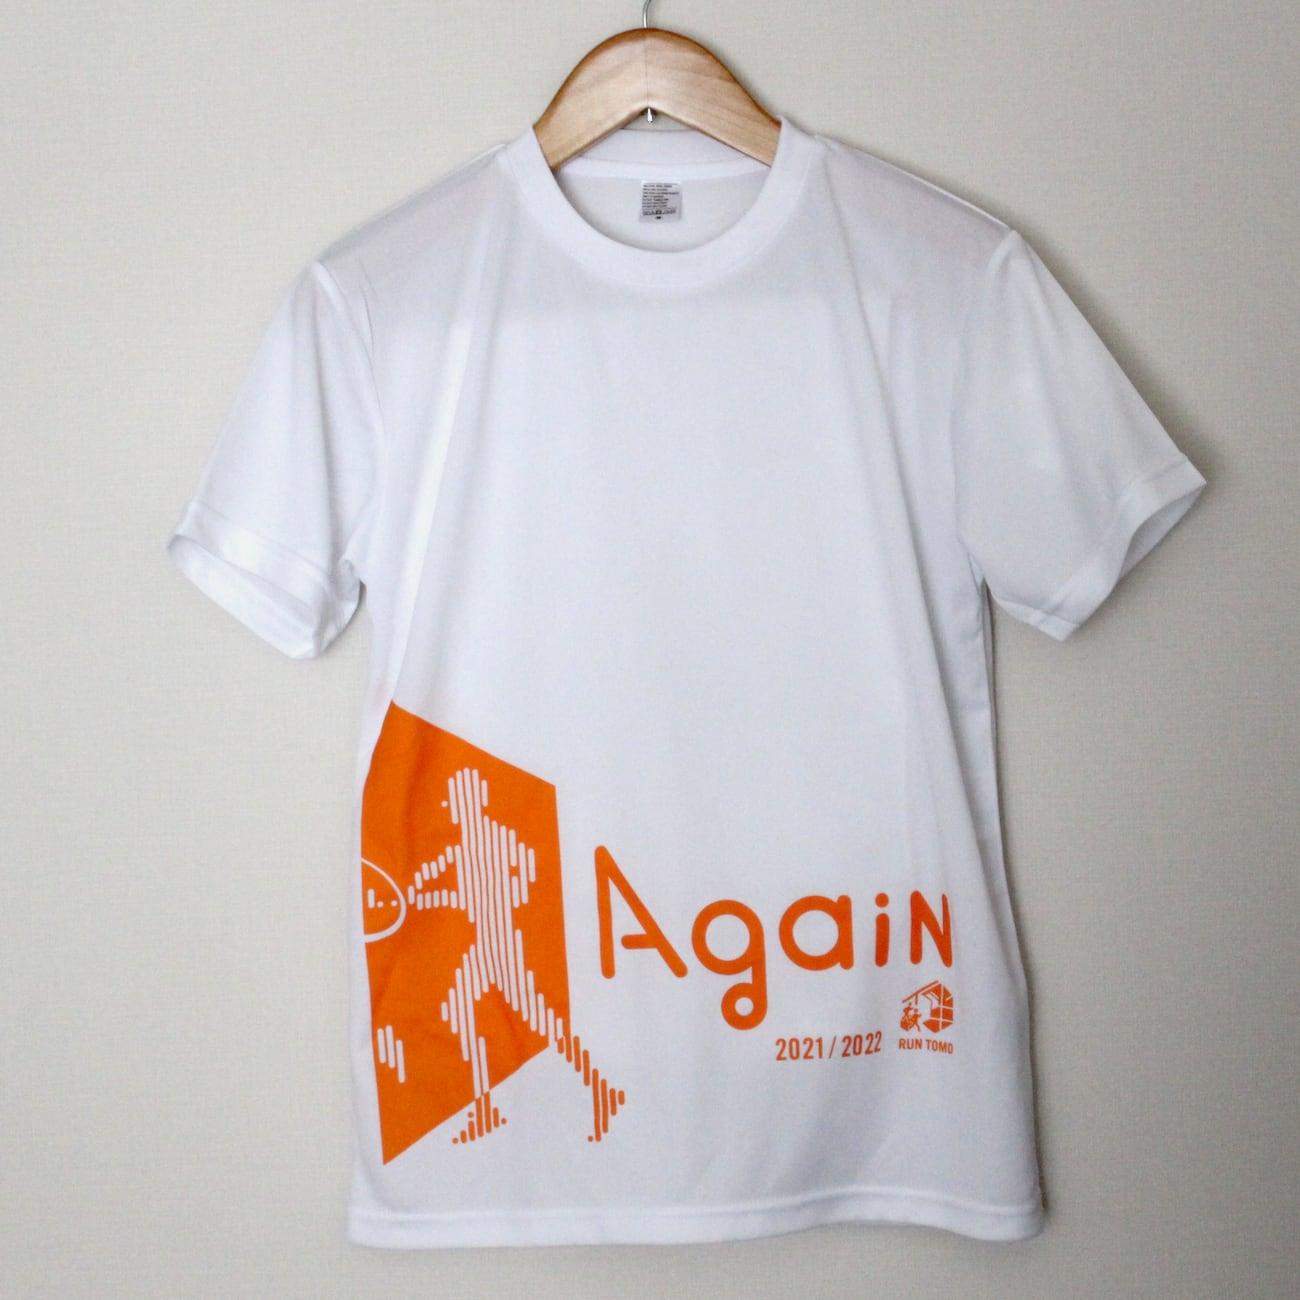 RUN伴2021/2022 公式Tシャツ(ホワイト/Again)